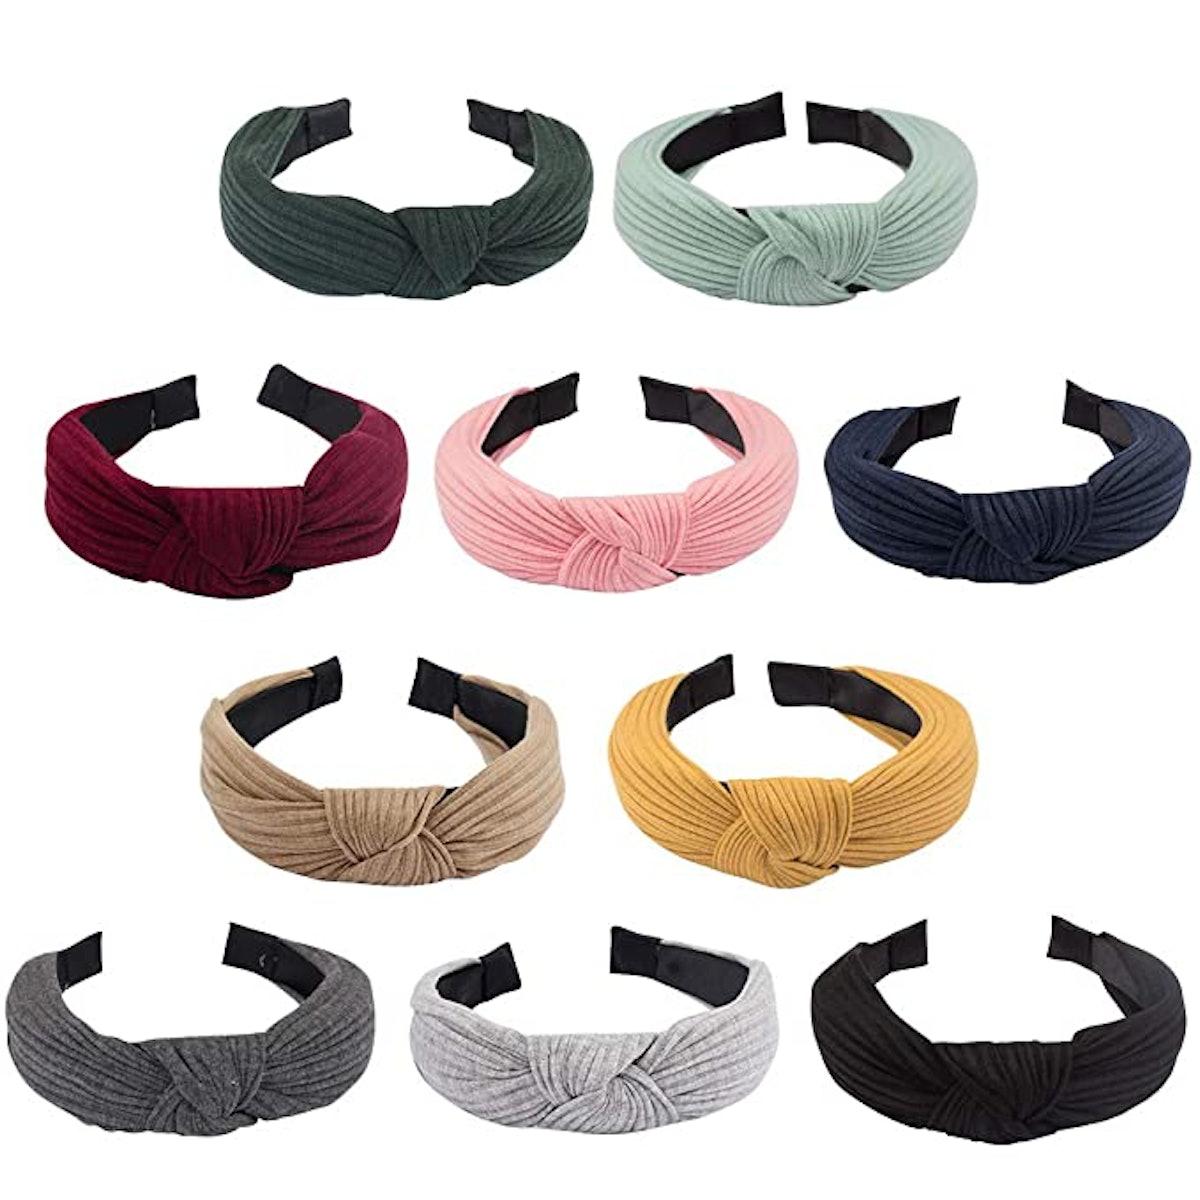 Jaciya Knotted Headbands (10 Pieces)